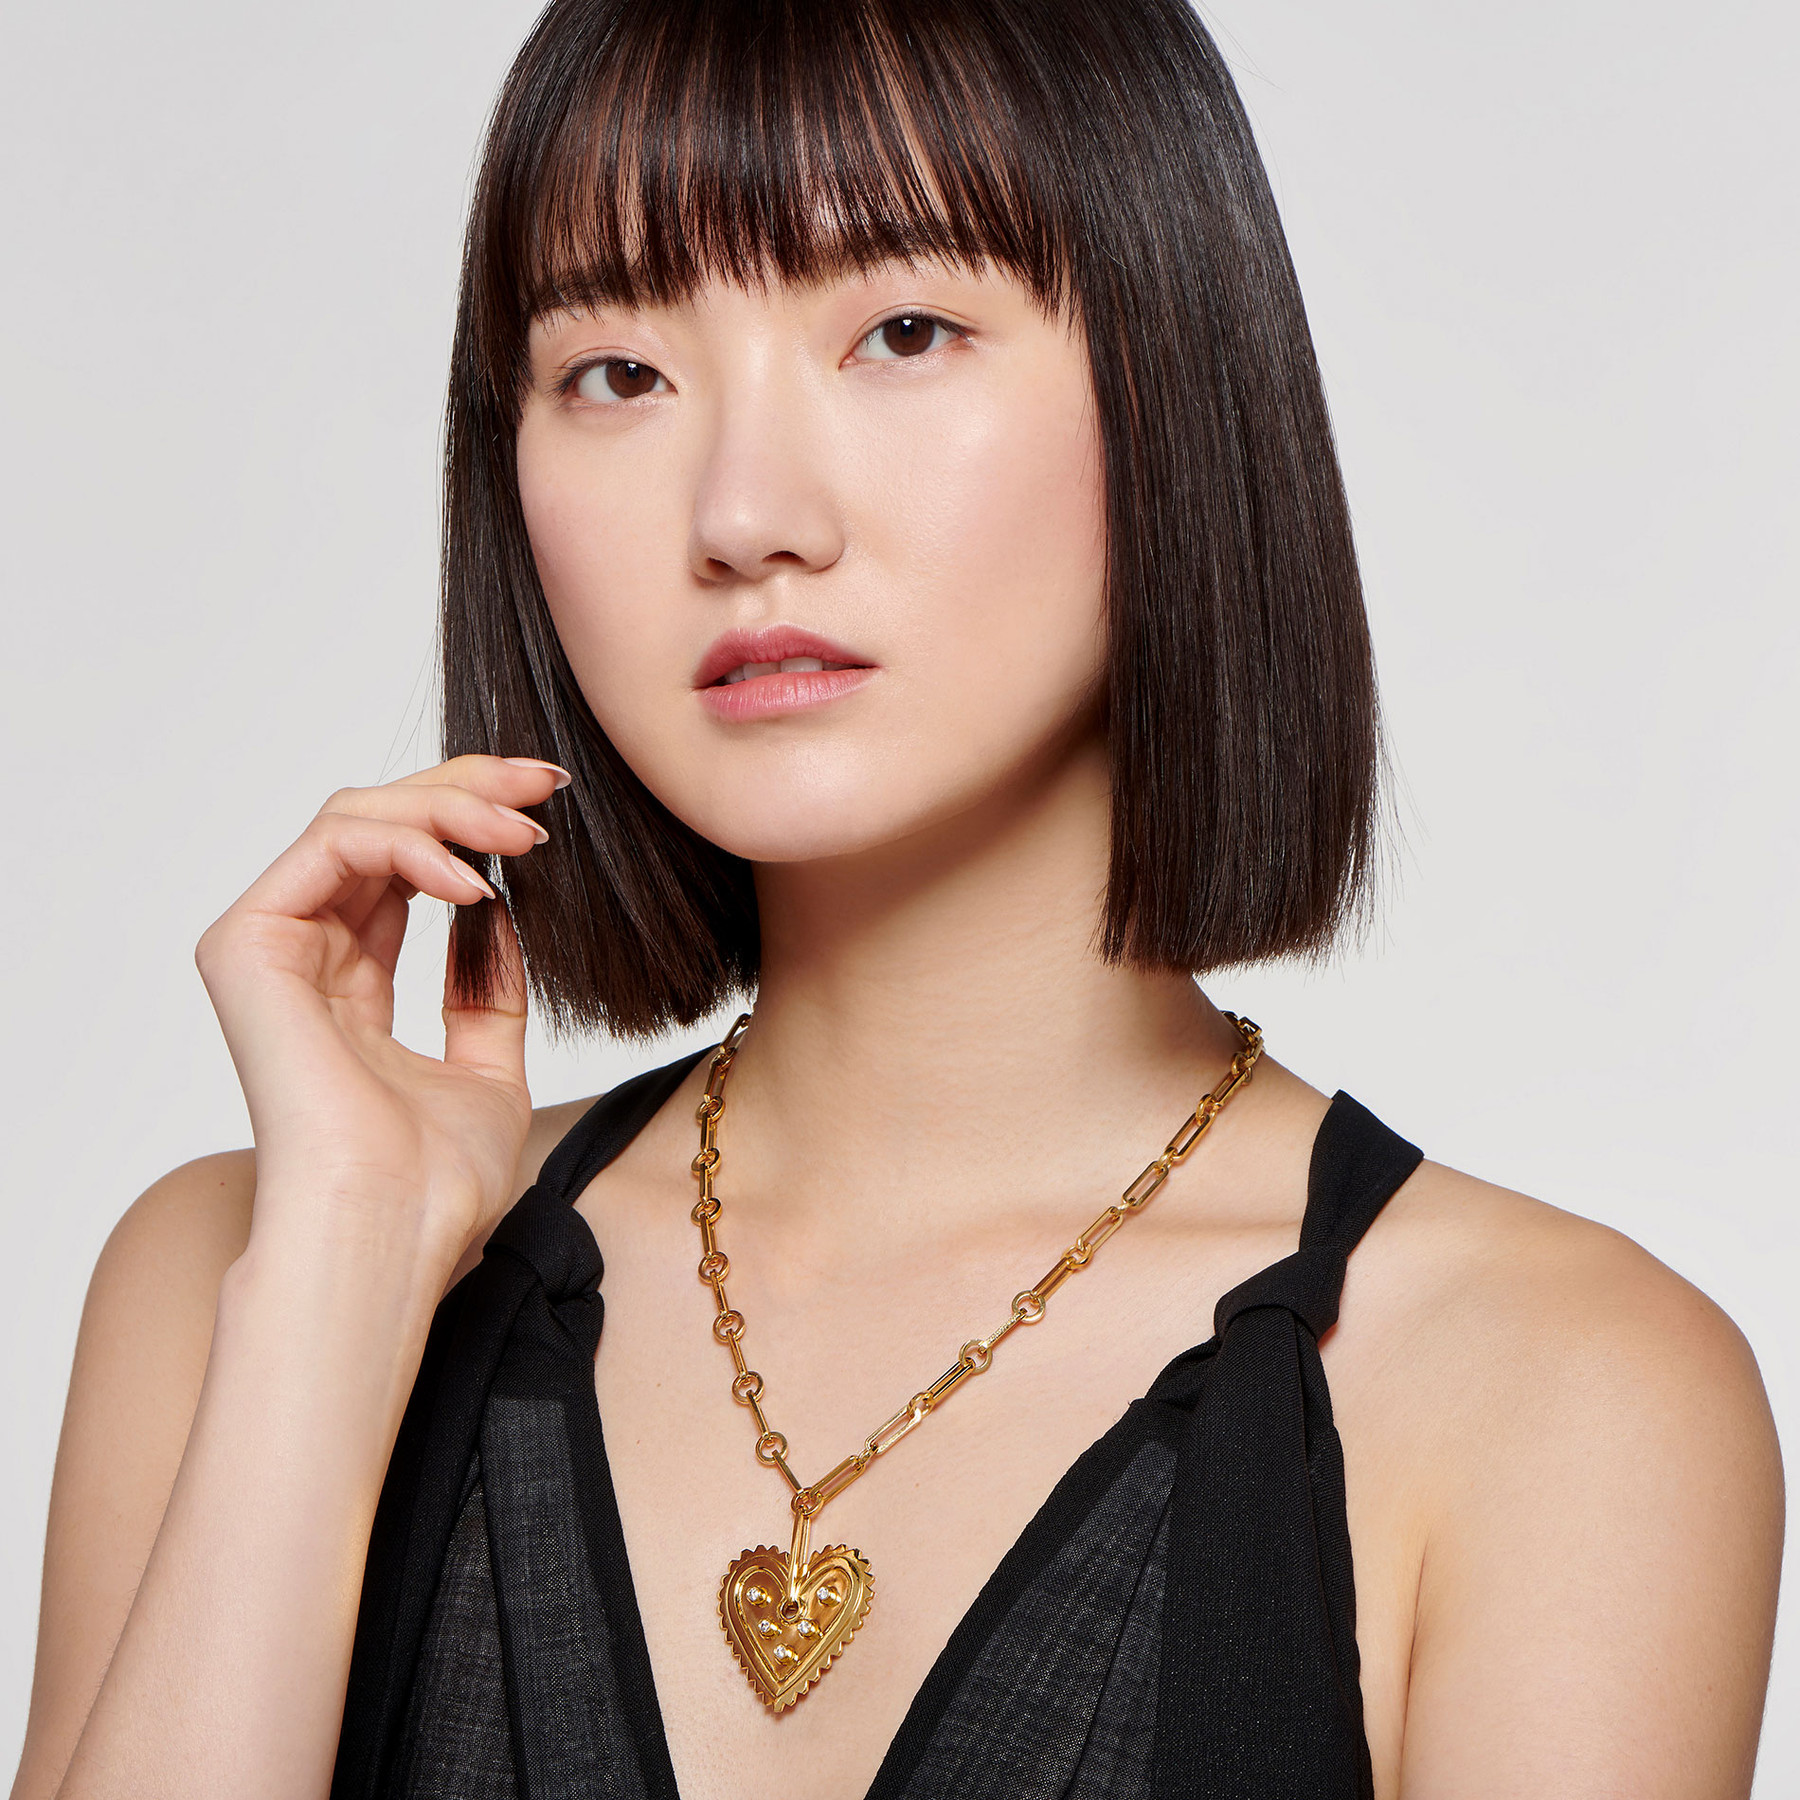 extravagant 22 karat gold necklace with diamond-studded heart pendant on stunning East Asian model